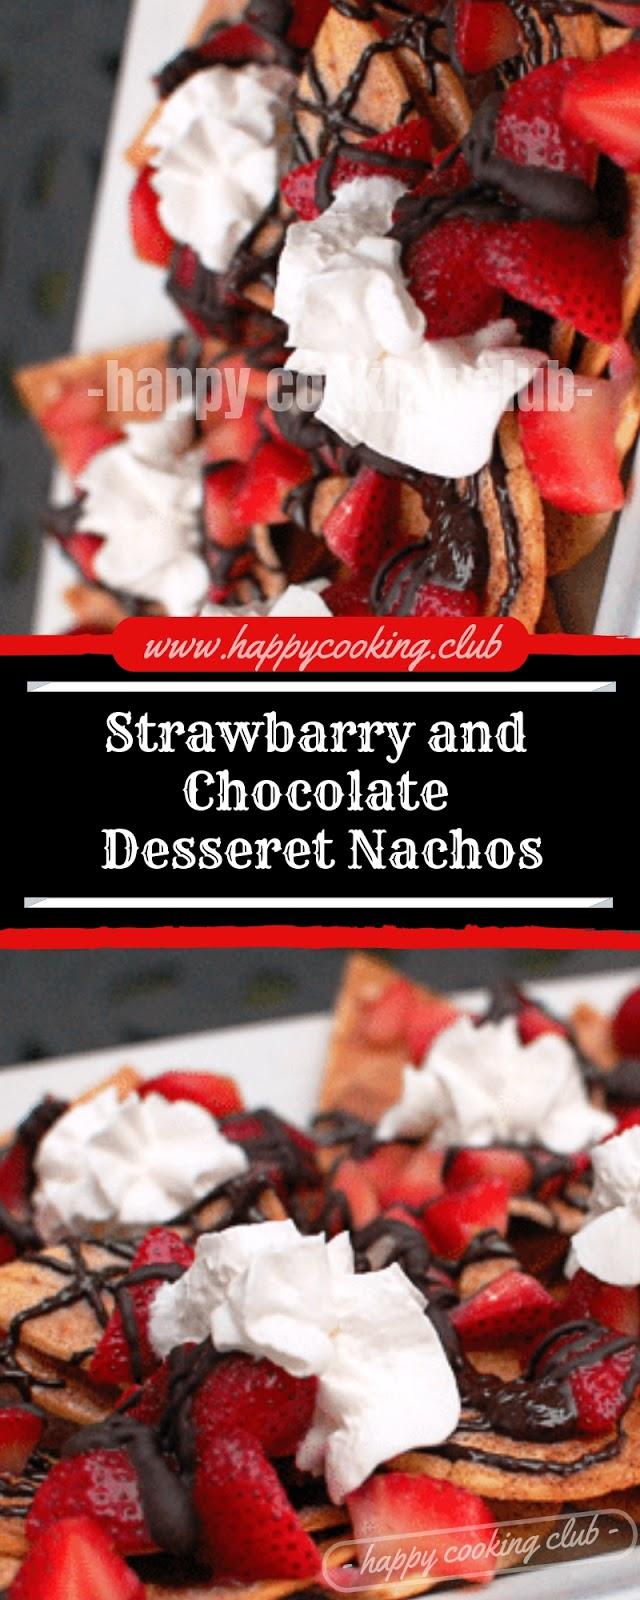 Strawbarry and Chocolate Desseret Nachos